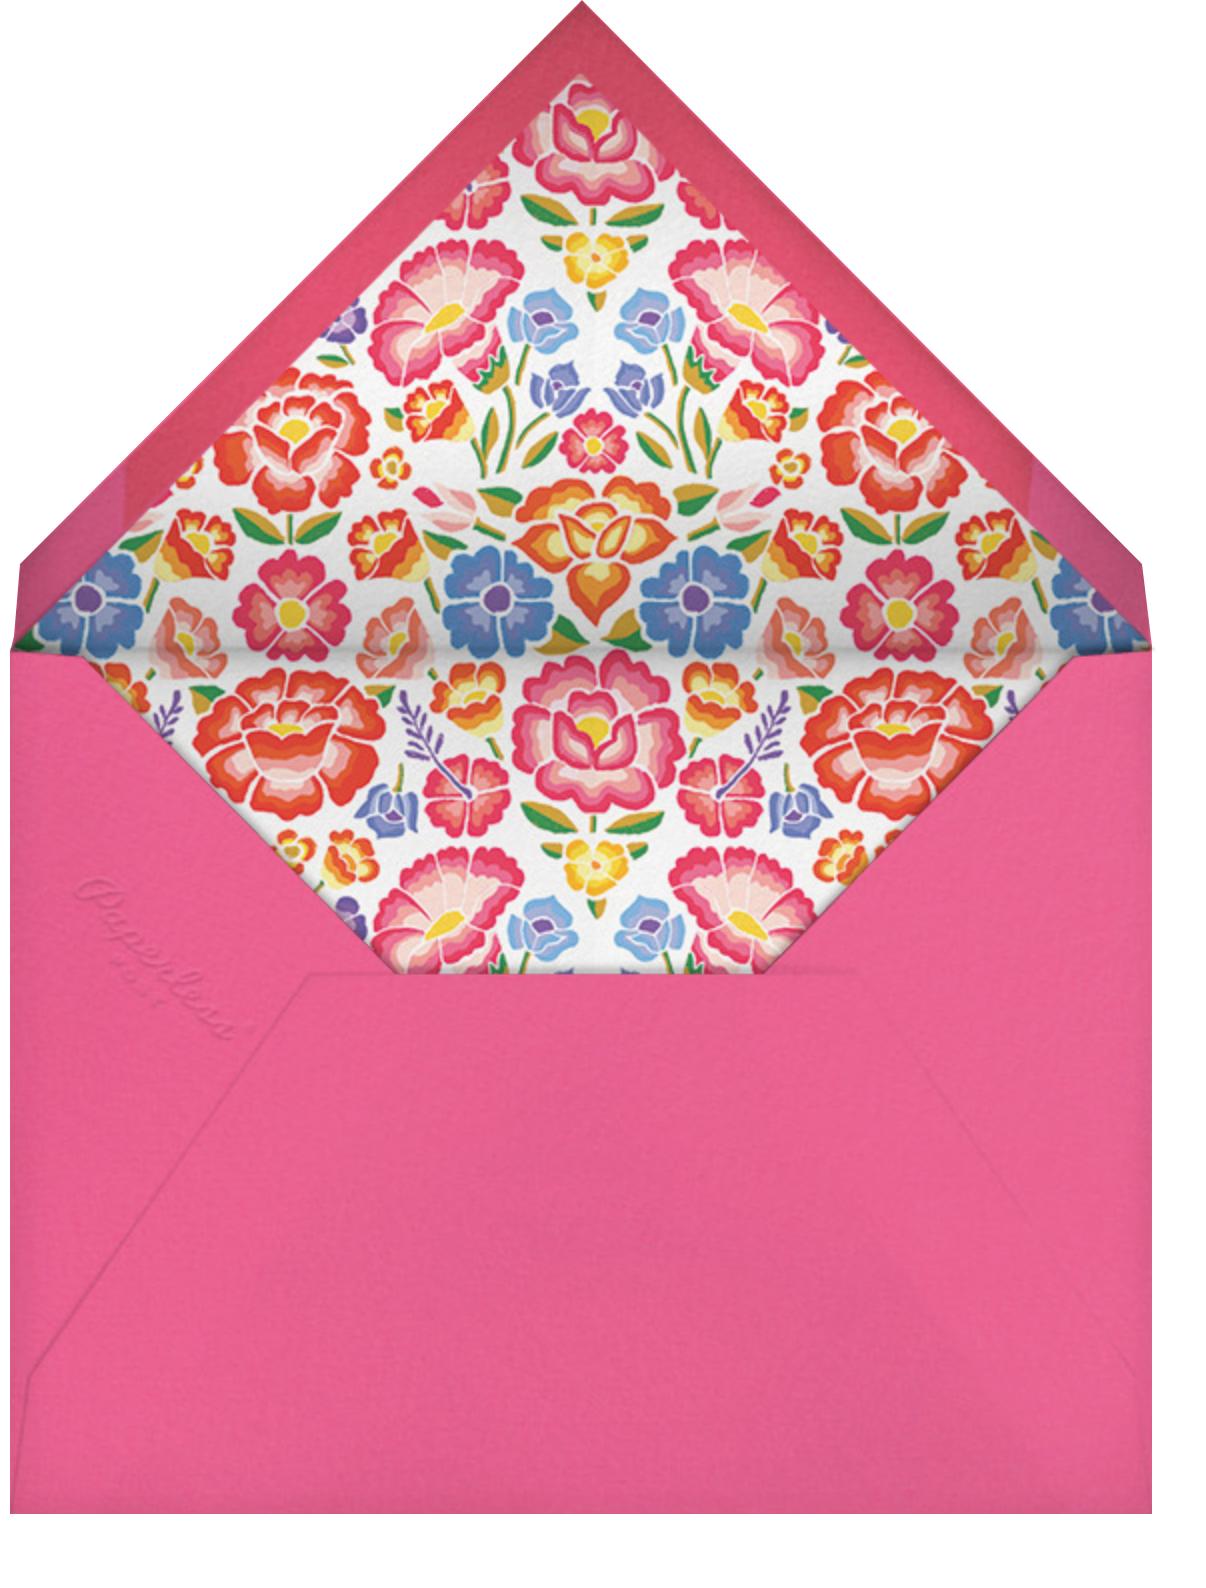 De Colores Fiesta - Paperless Post - Envelope